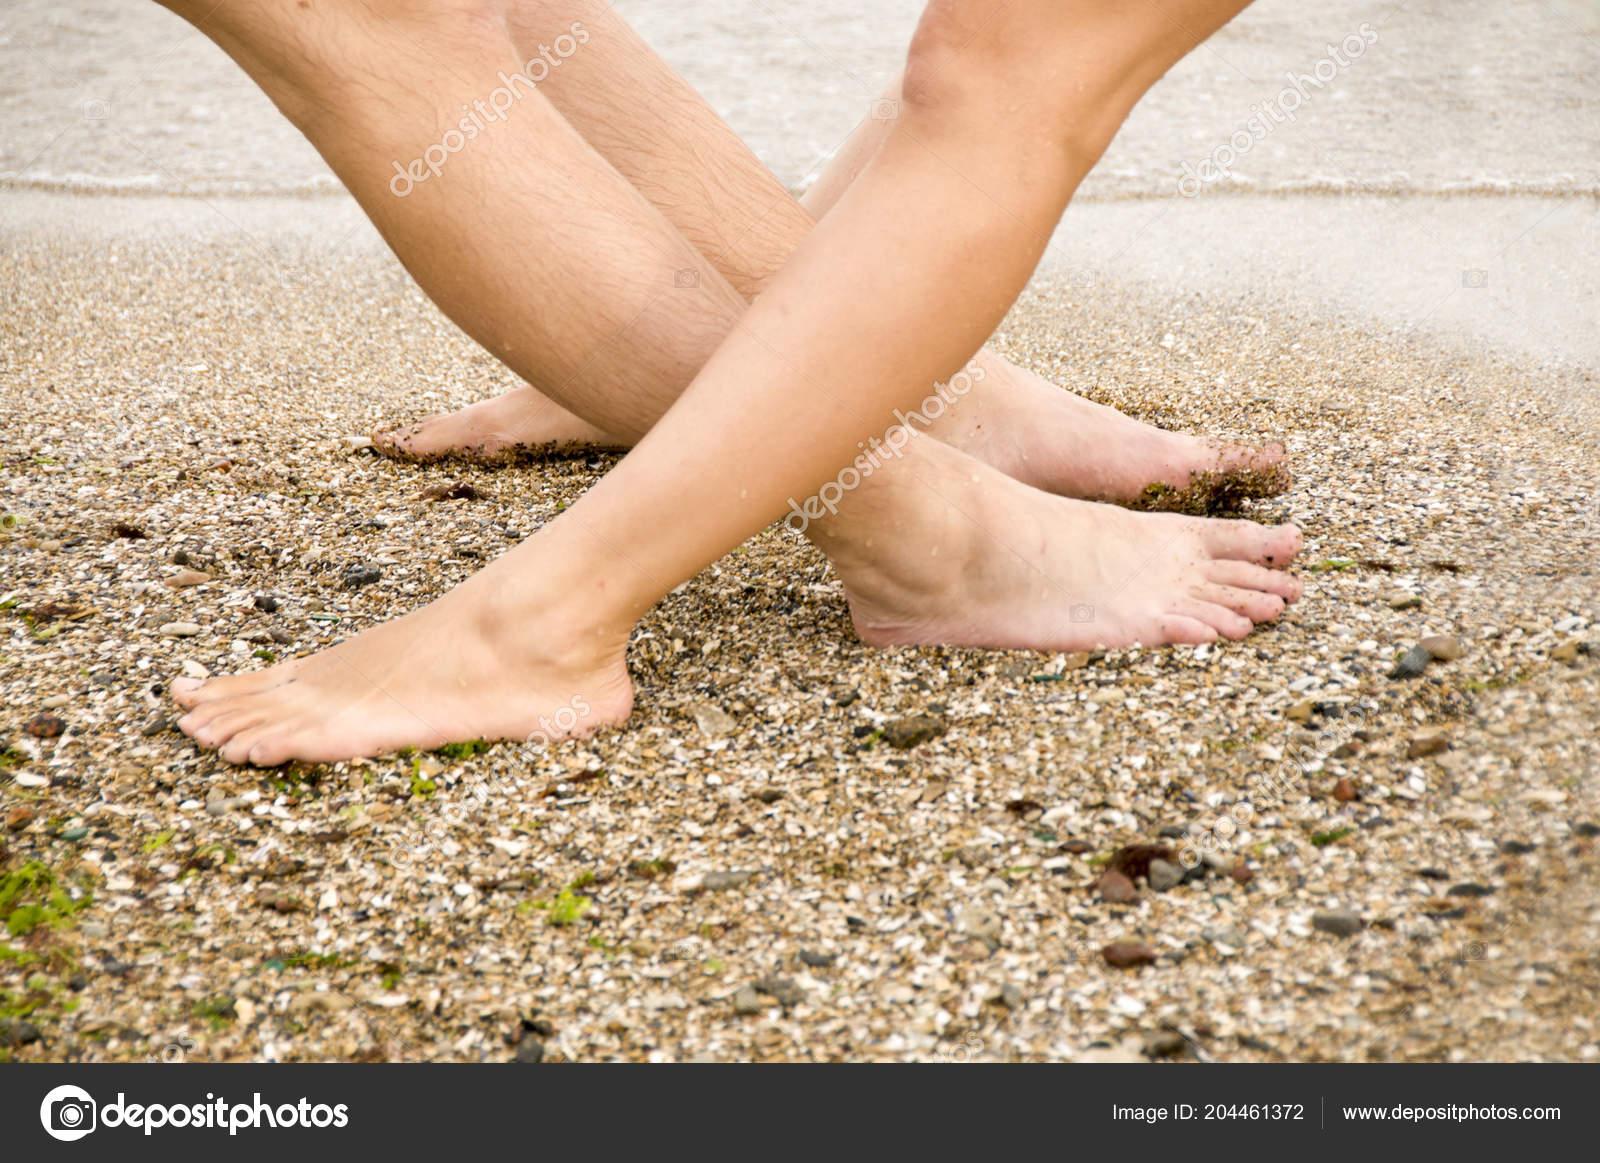 Share woman bare feet